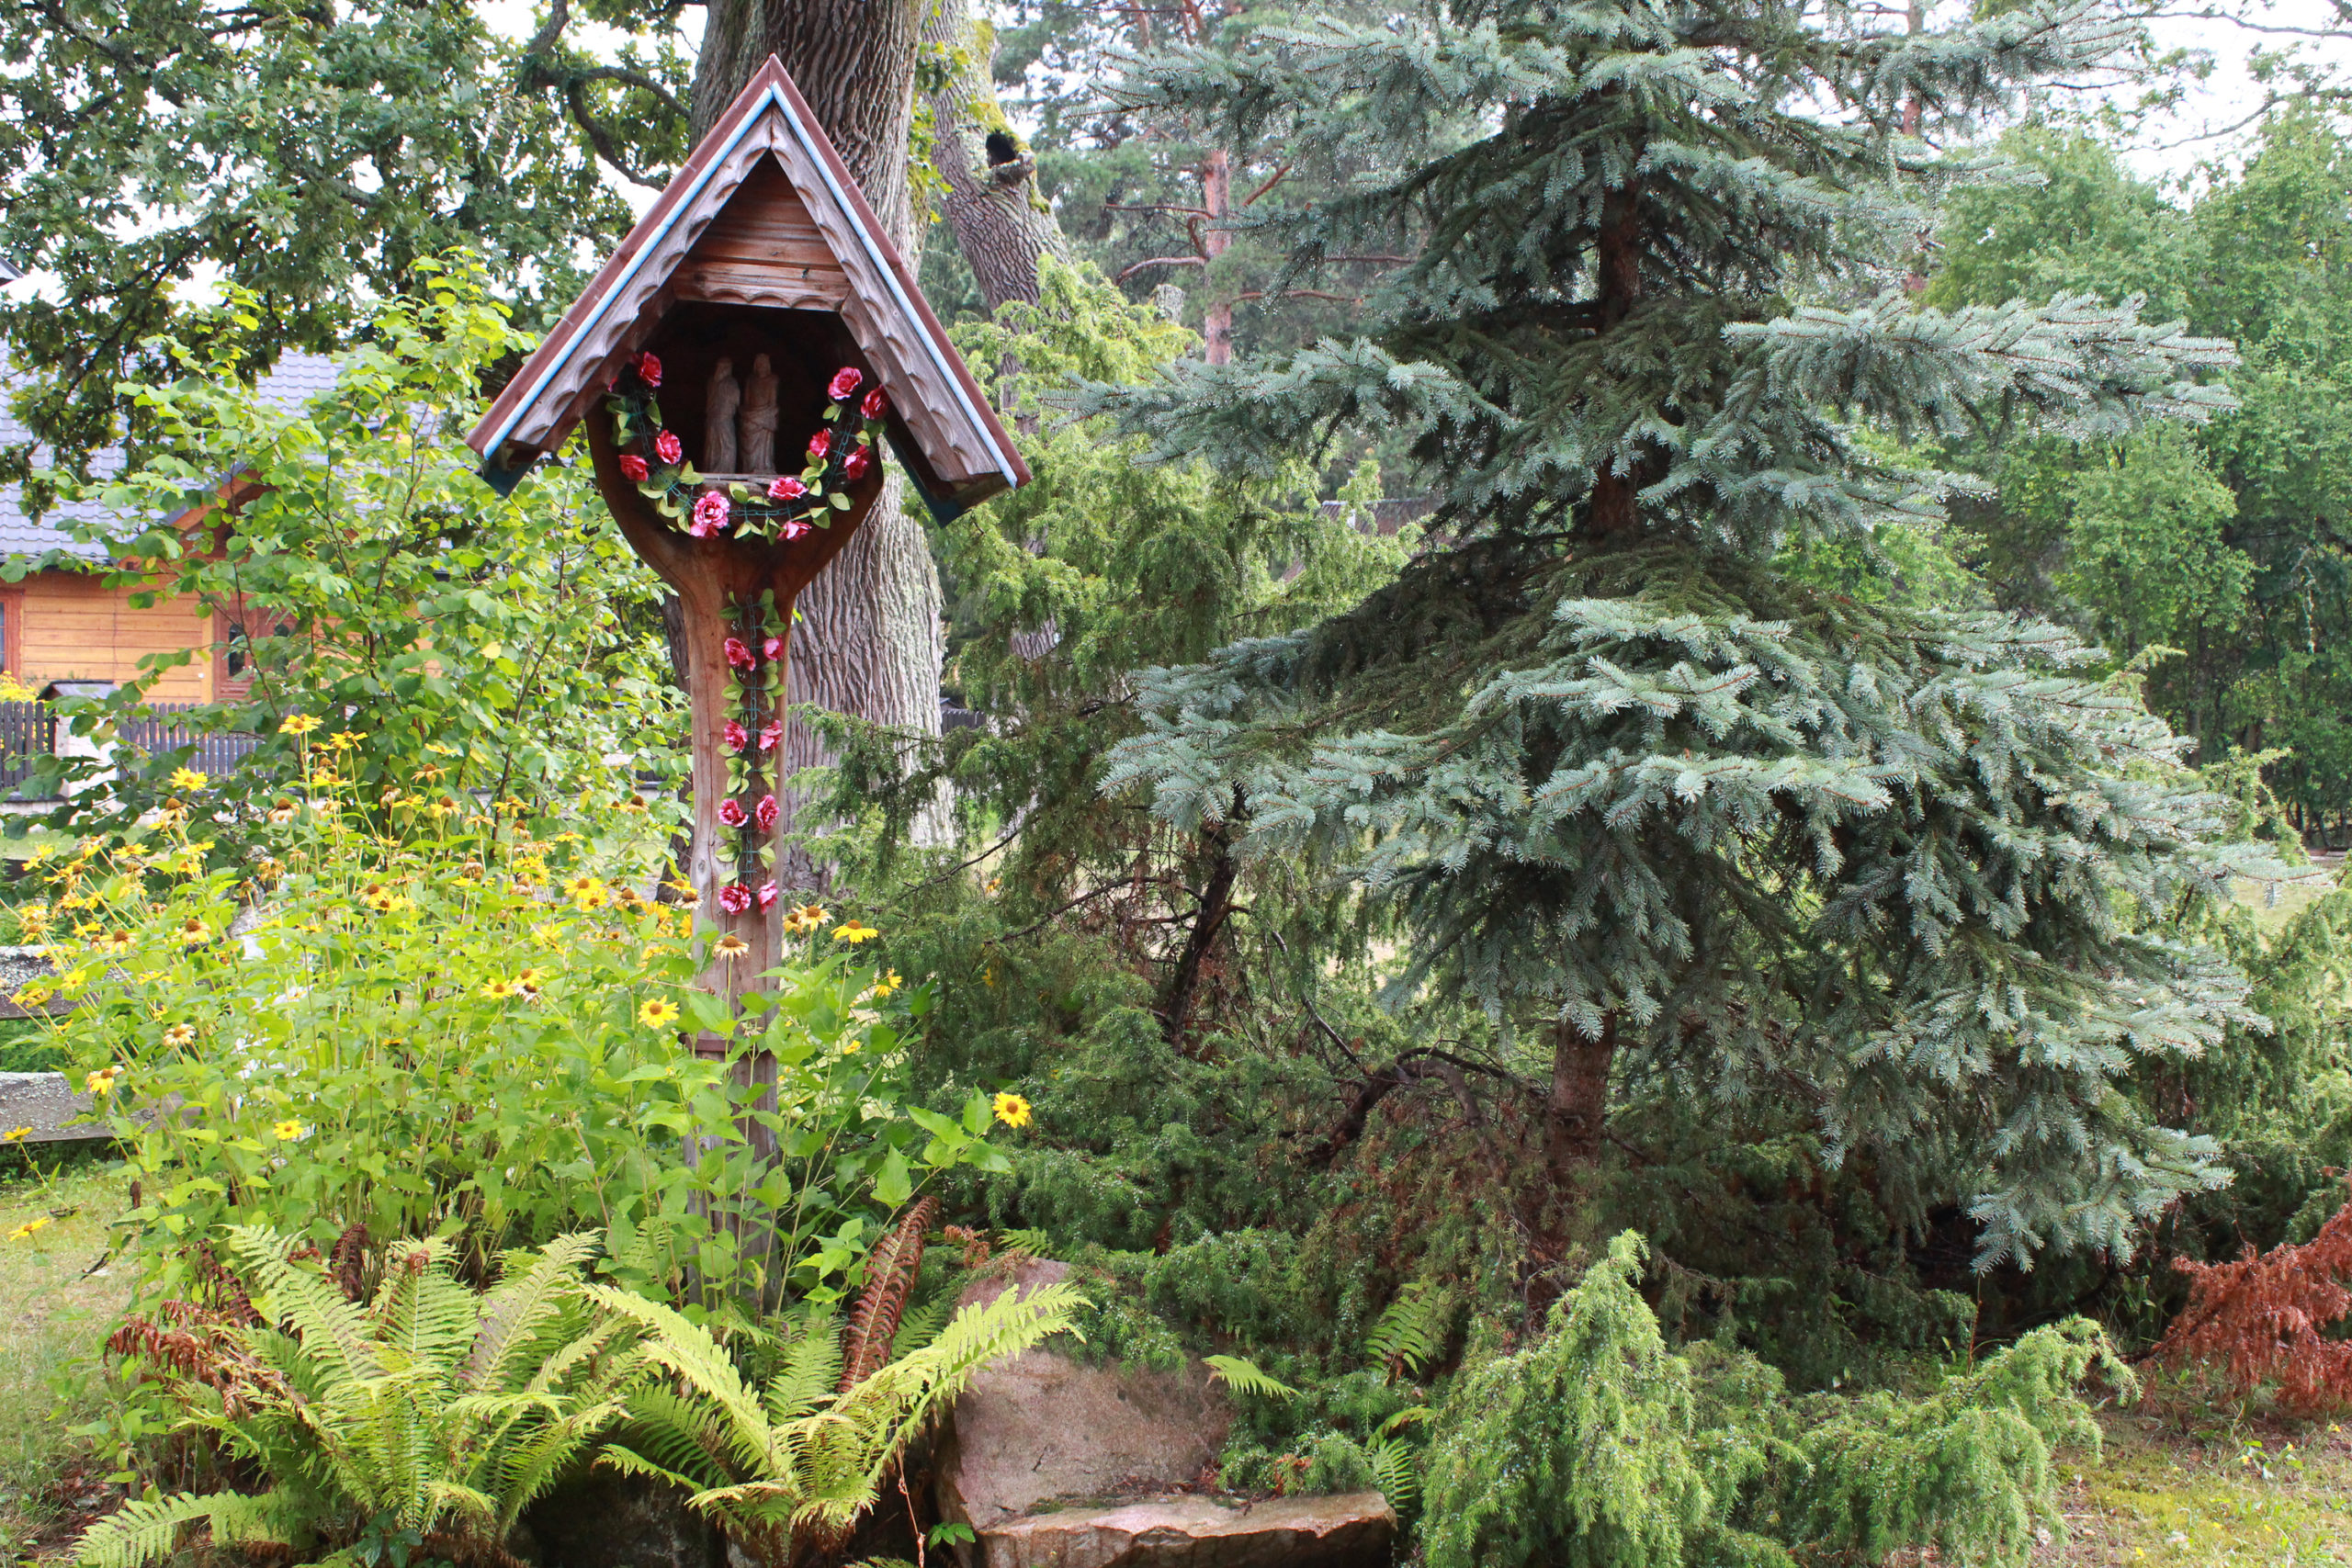 kapliczka wśród zieleni